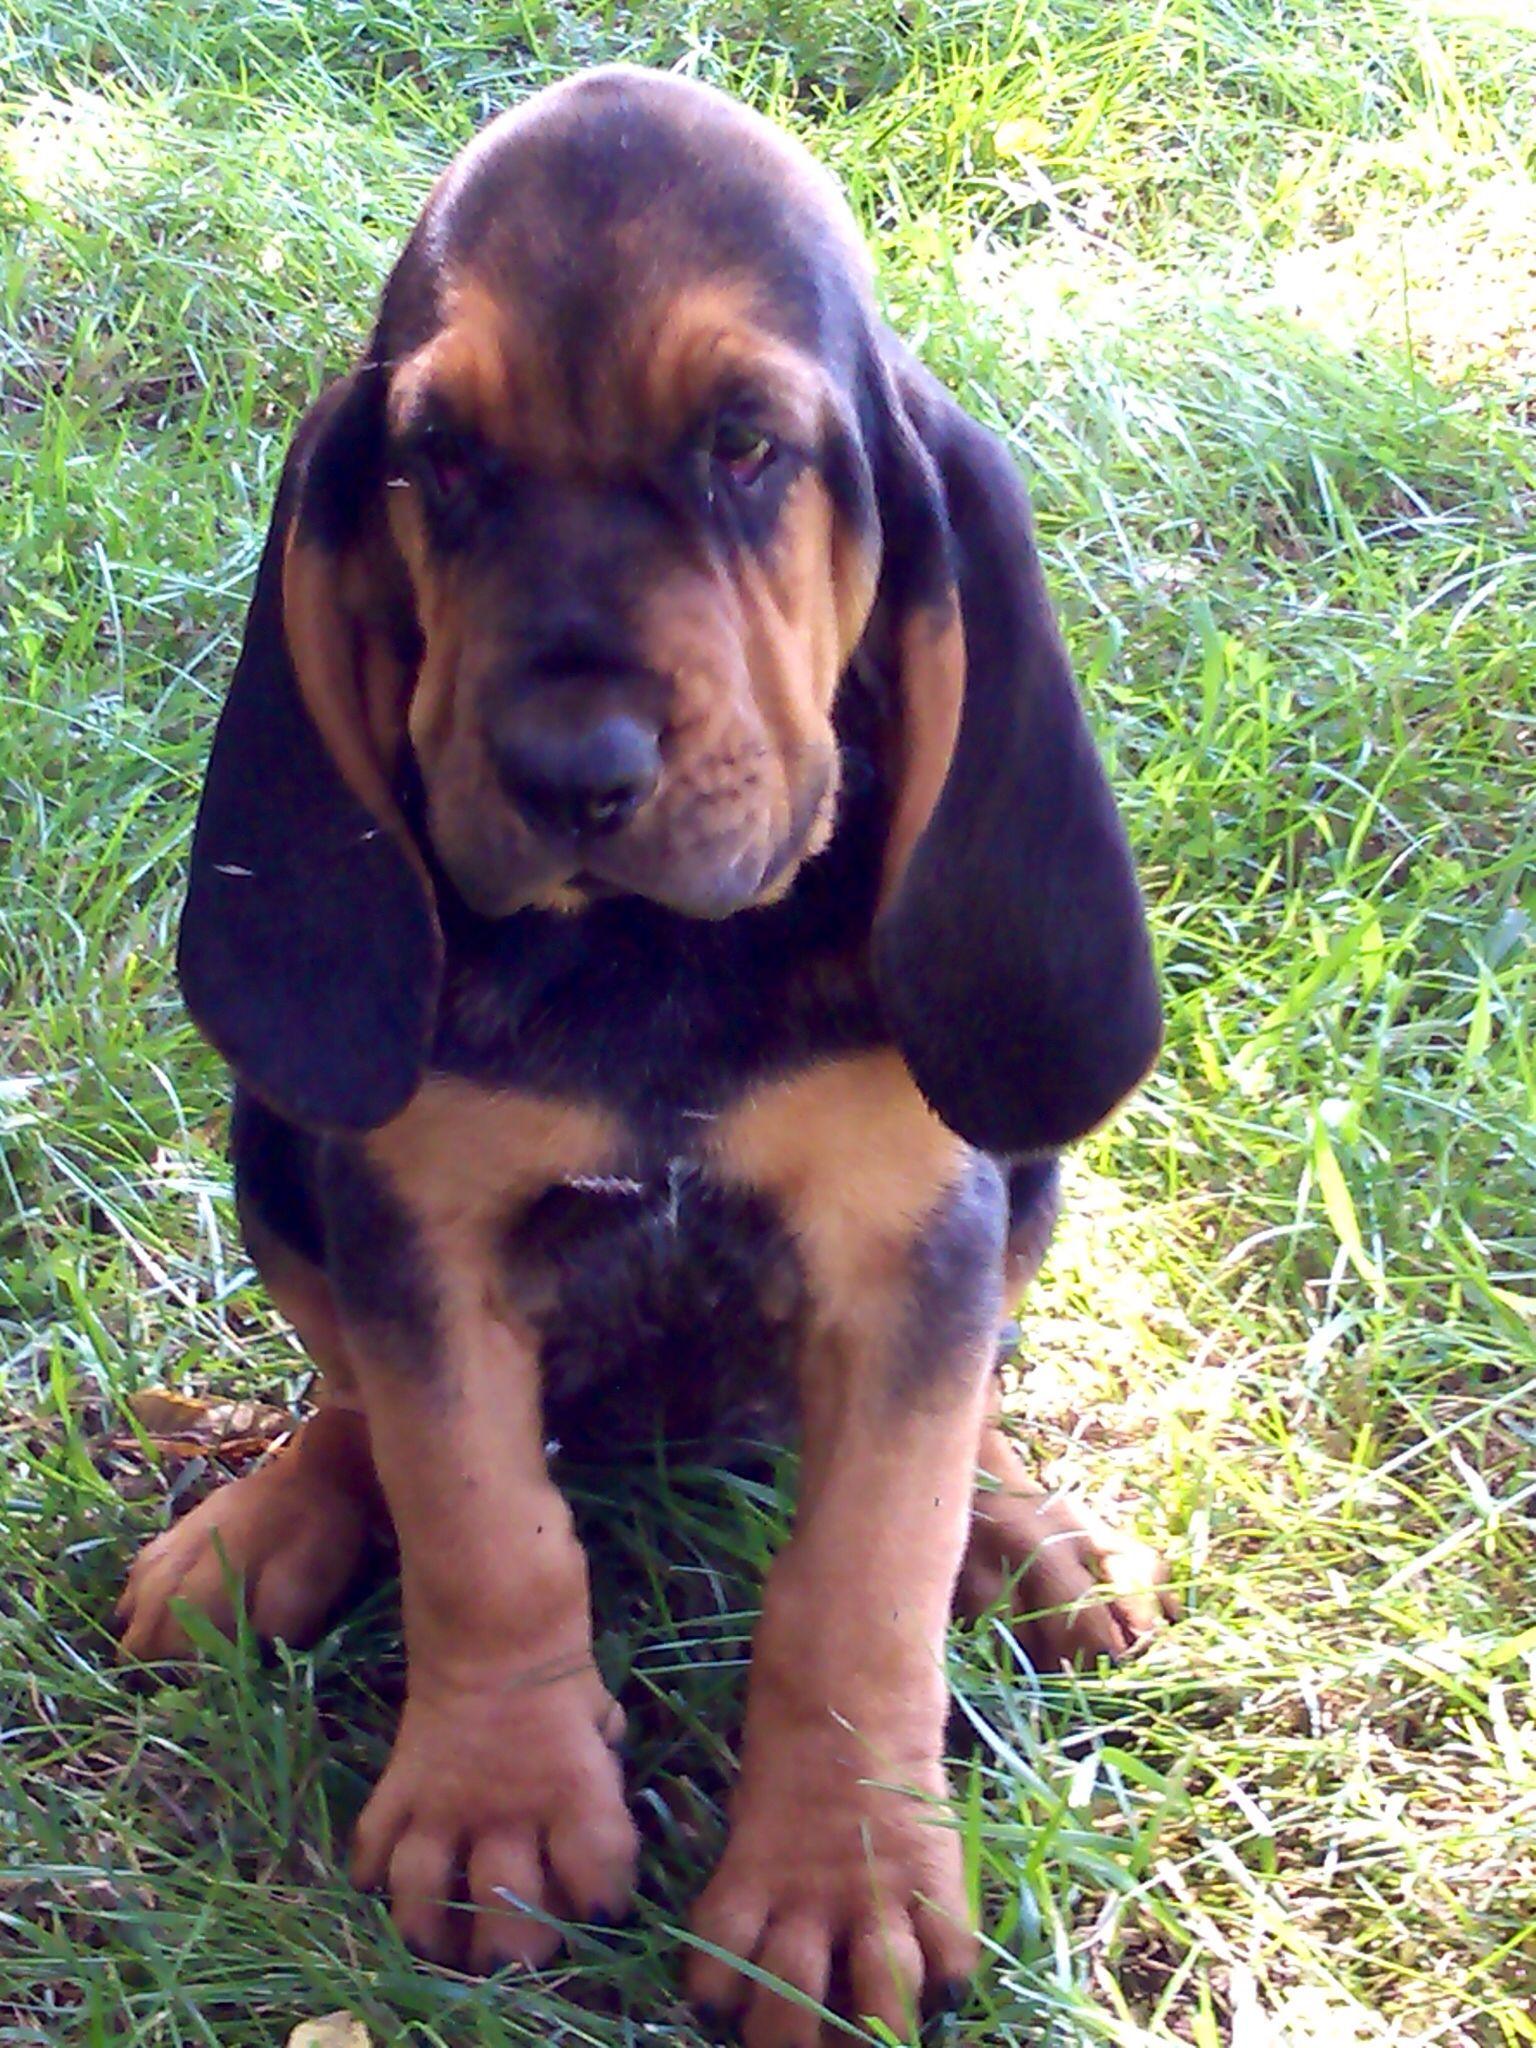 European Bloodhound puppy Sgt. Lucky the Red Bloodhound